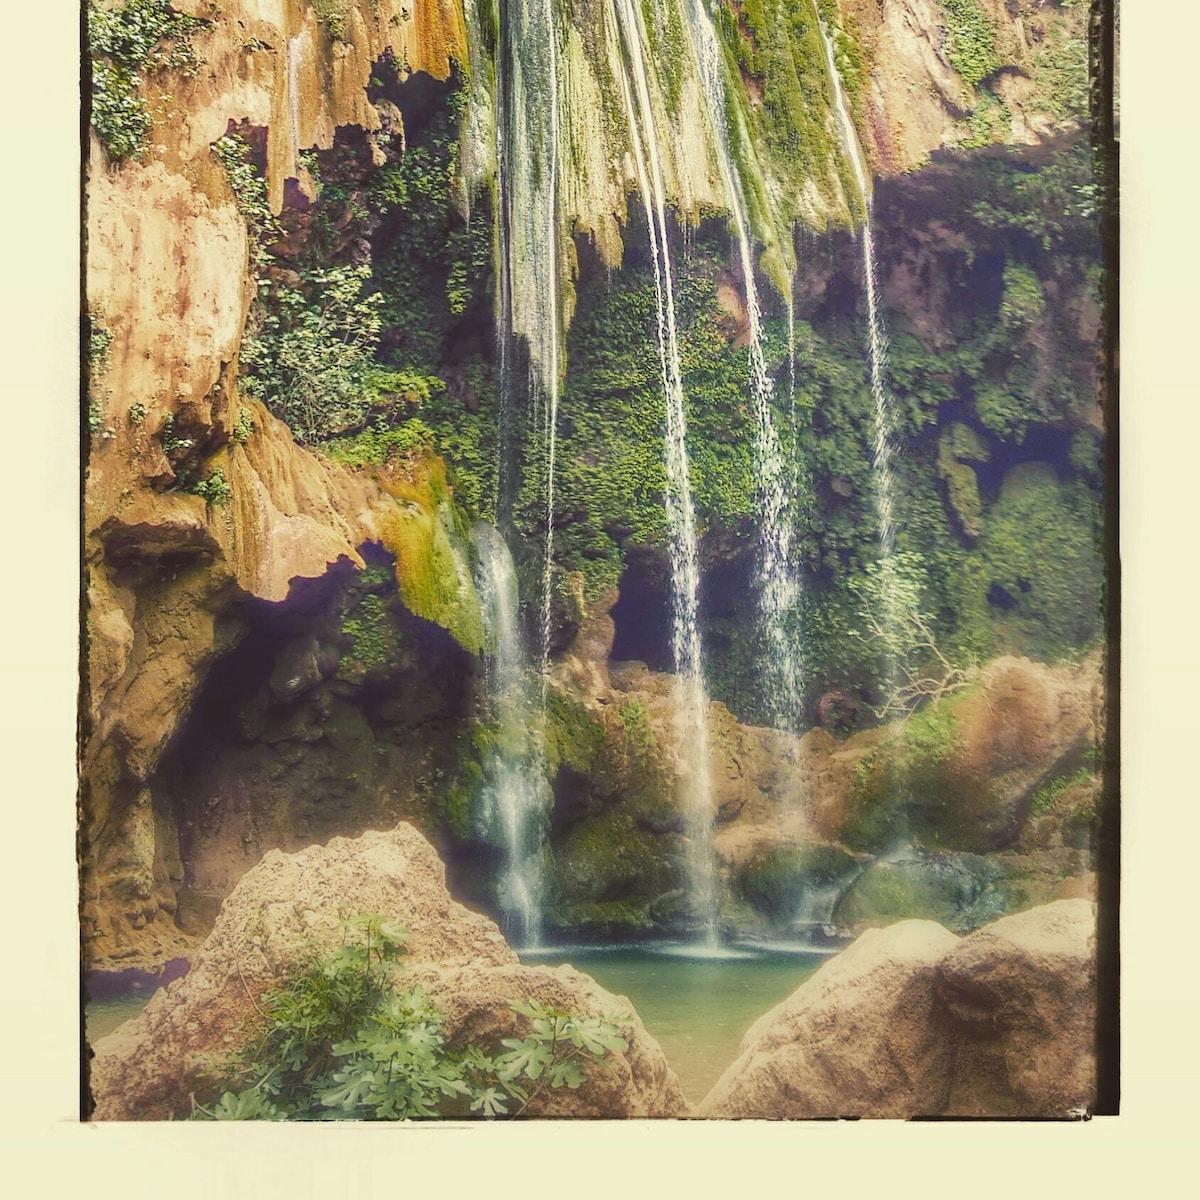 Akshour waterfalls